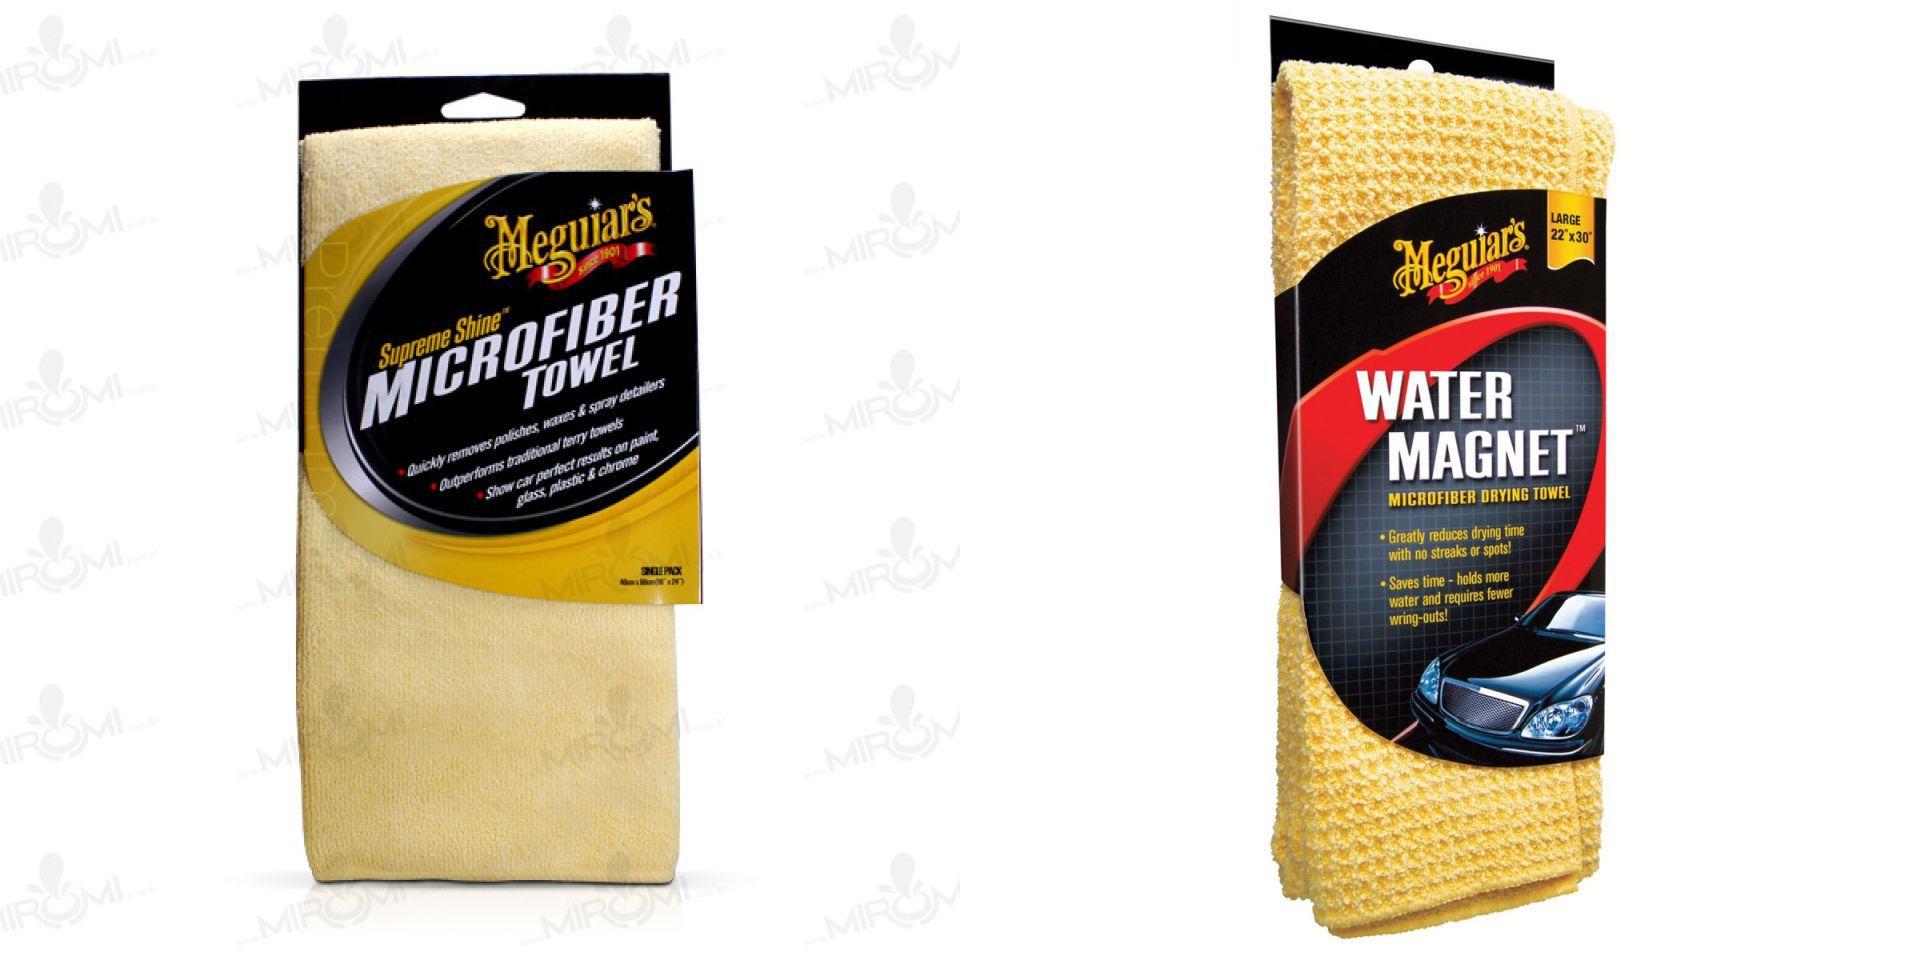 Kit Toalha Water Magnet, Flanela De Microfibra Supreme Shine